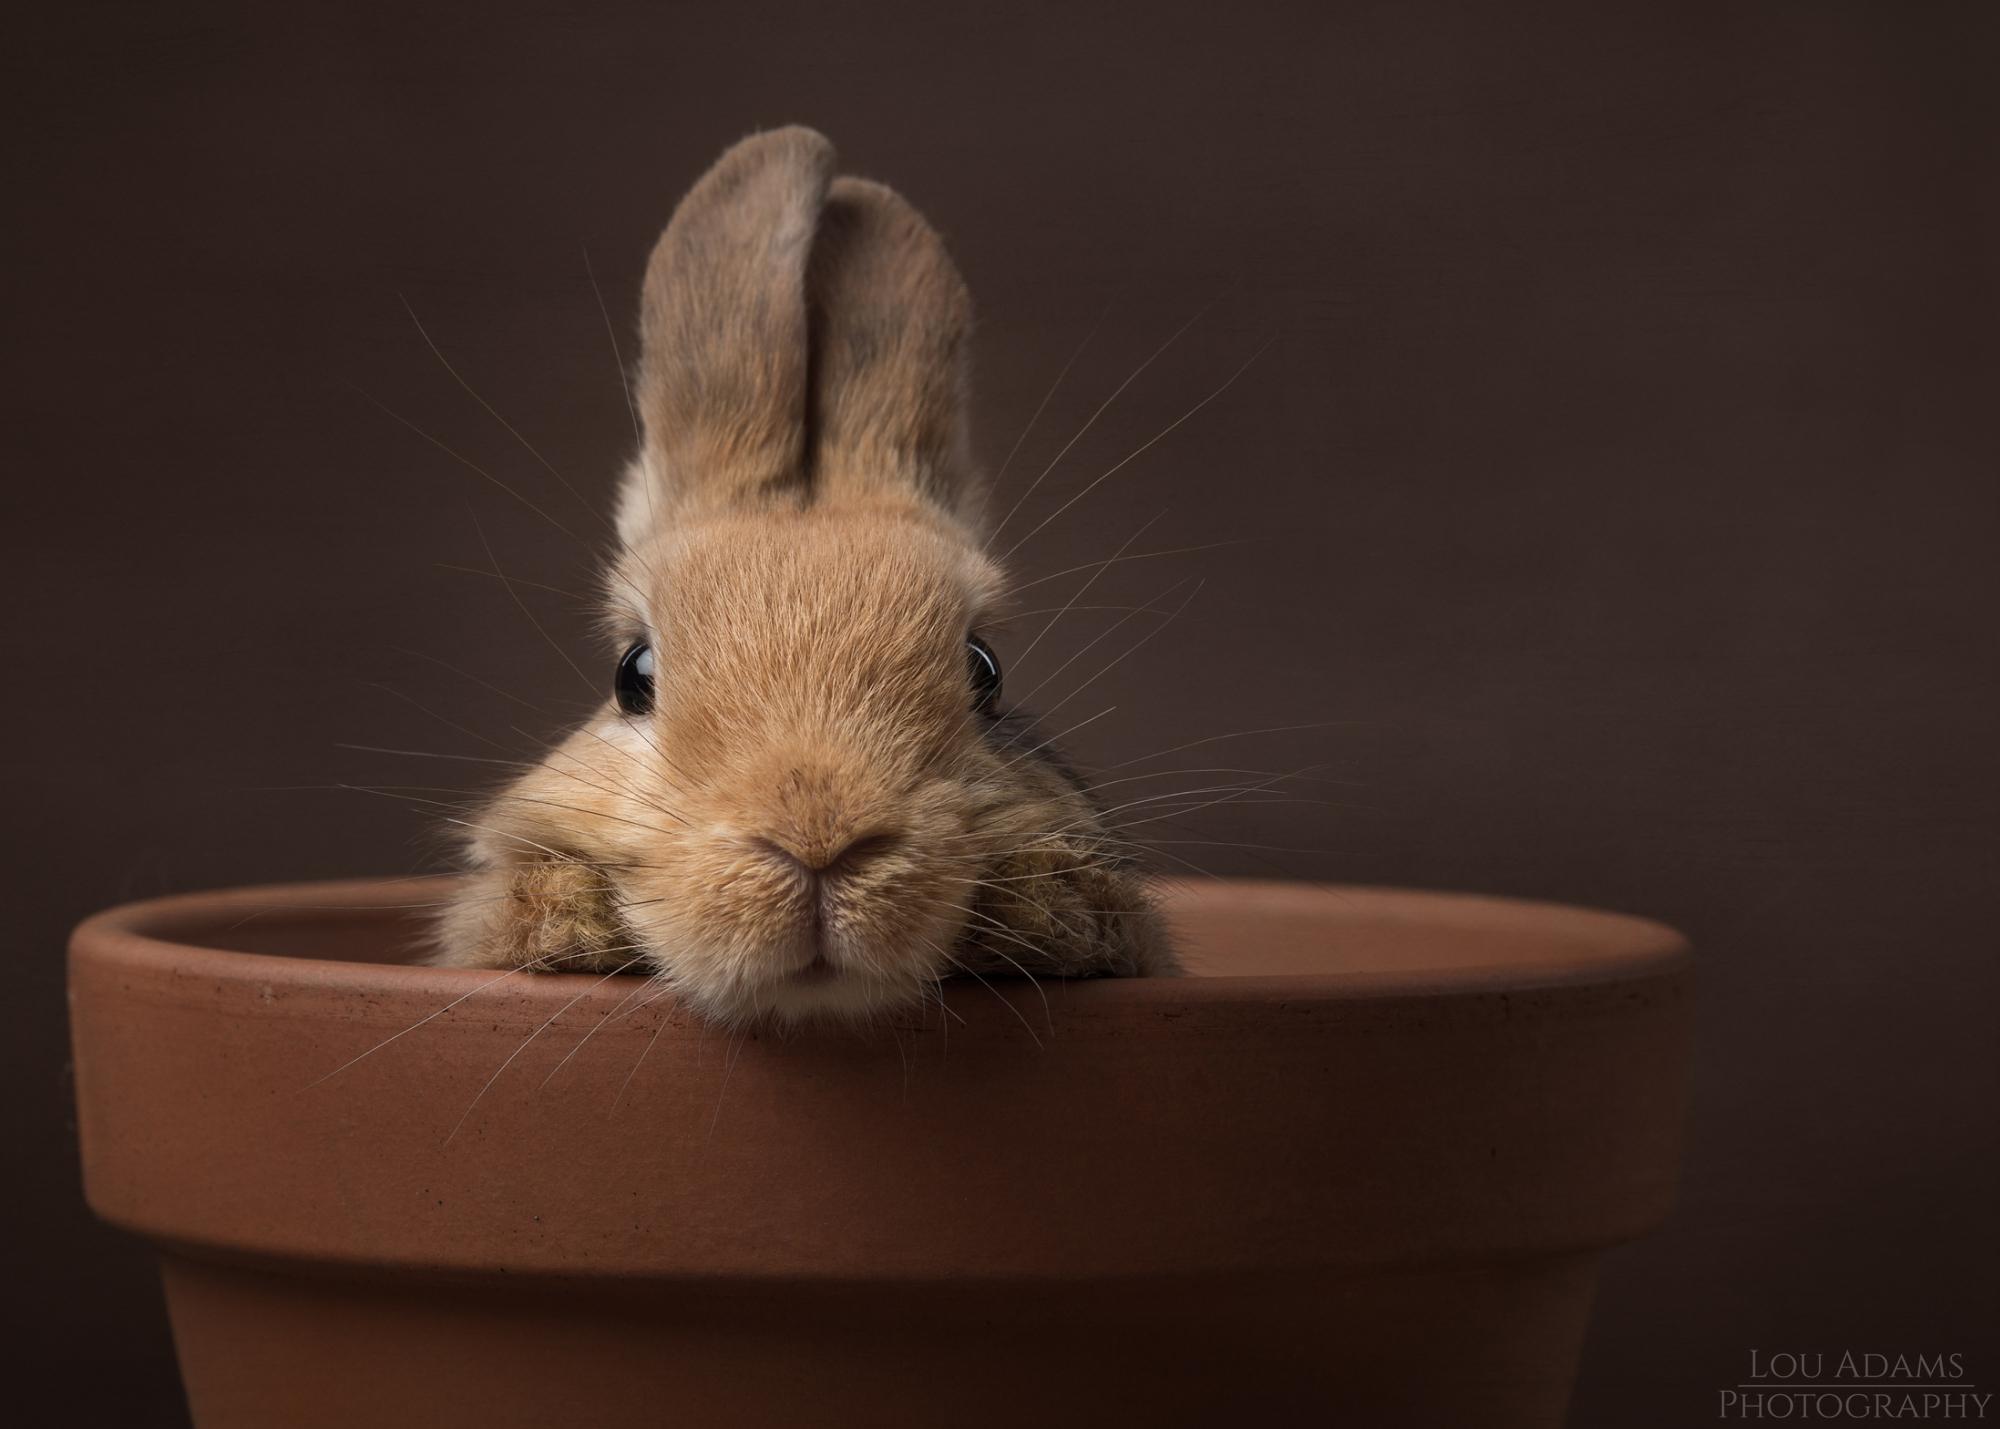 Lou Adams Photography rabbit